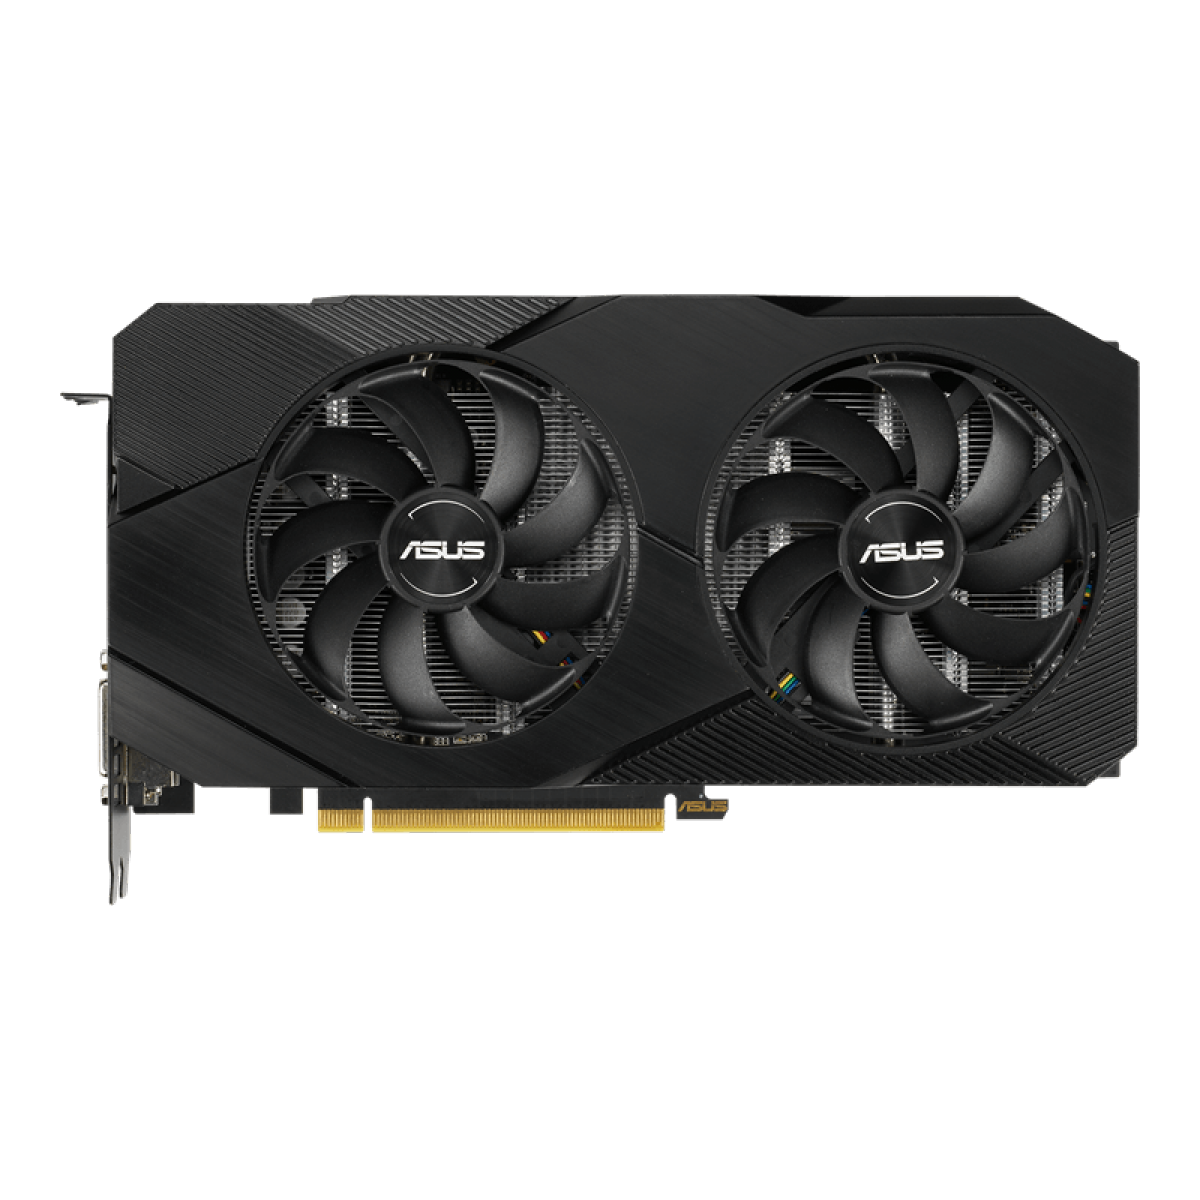 Placa de Vídeo Asus GeForce RTX 2060 OC EVO Dual, 6GB, GDDR6, DLSS, Ray Tracing, DUAL-RTX2060-O6G-EVO